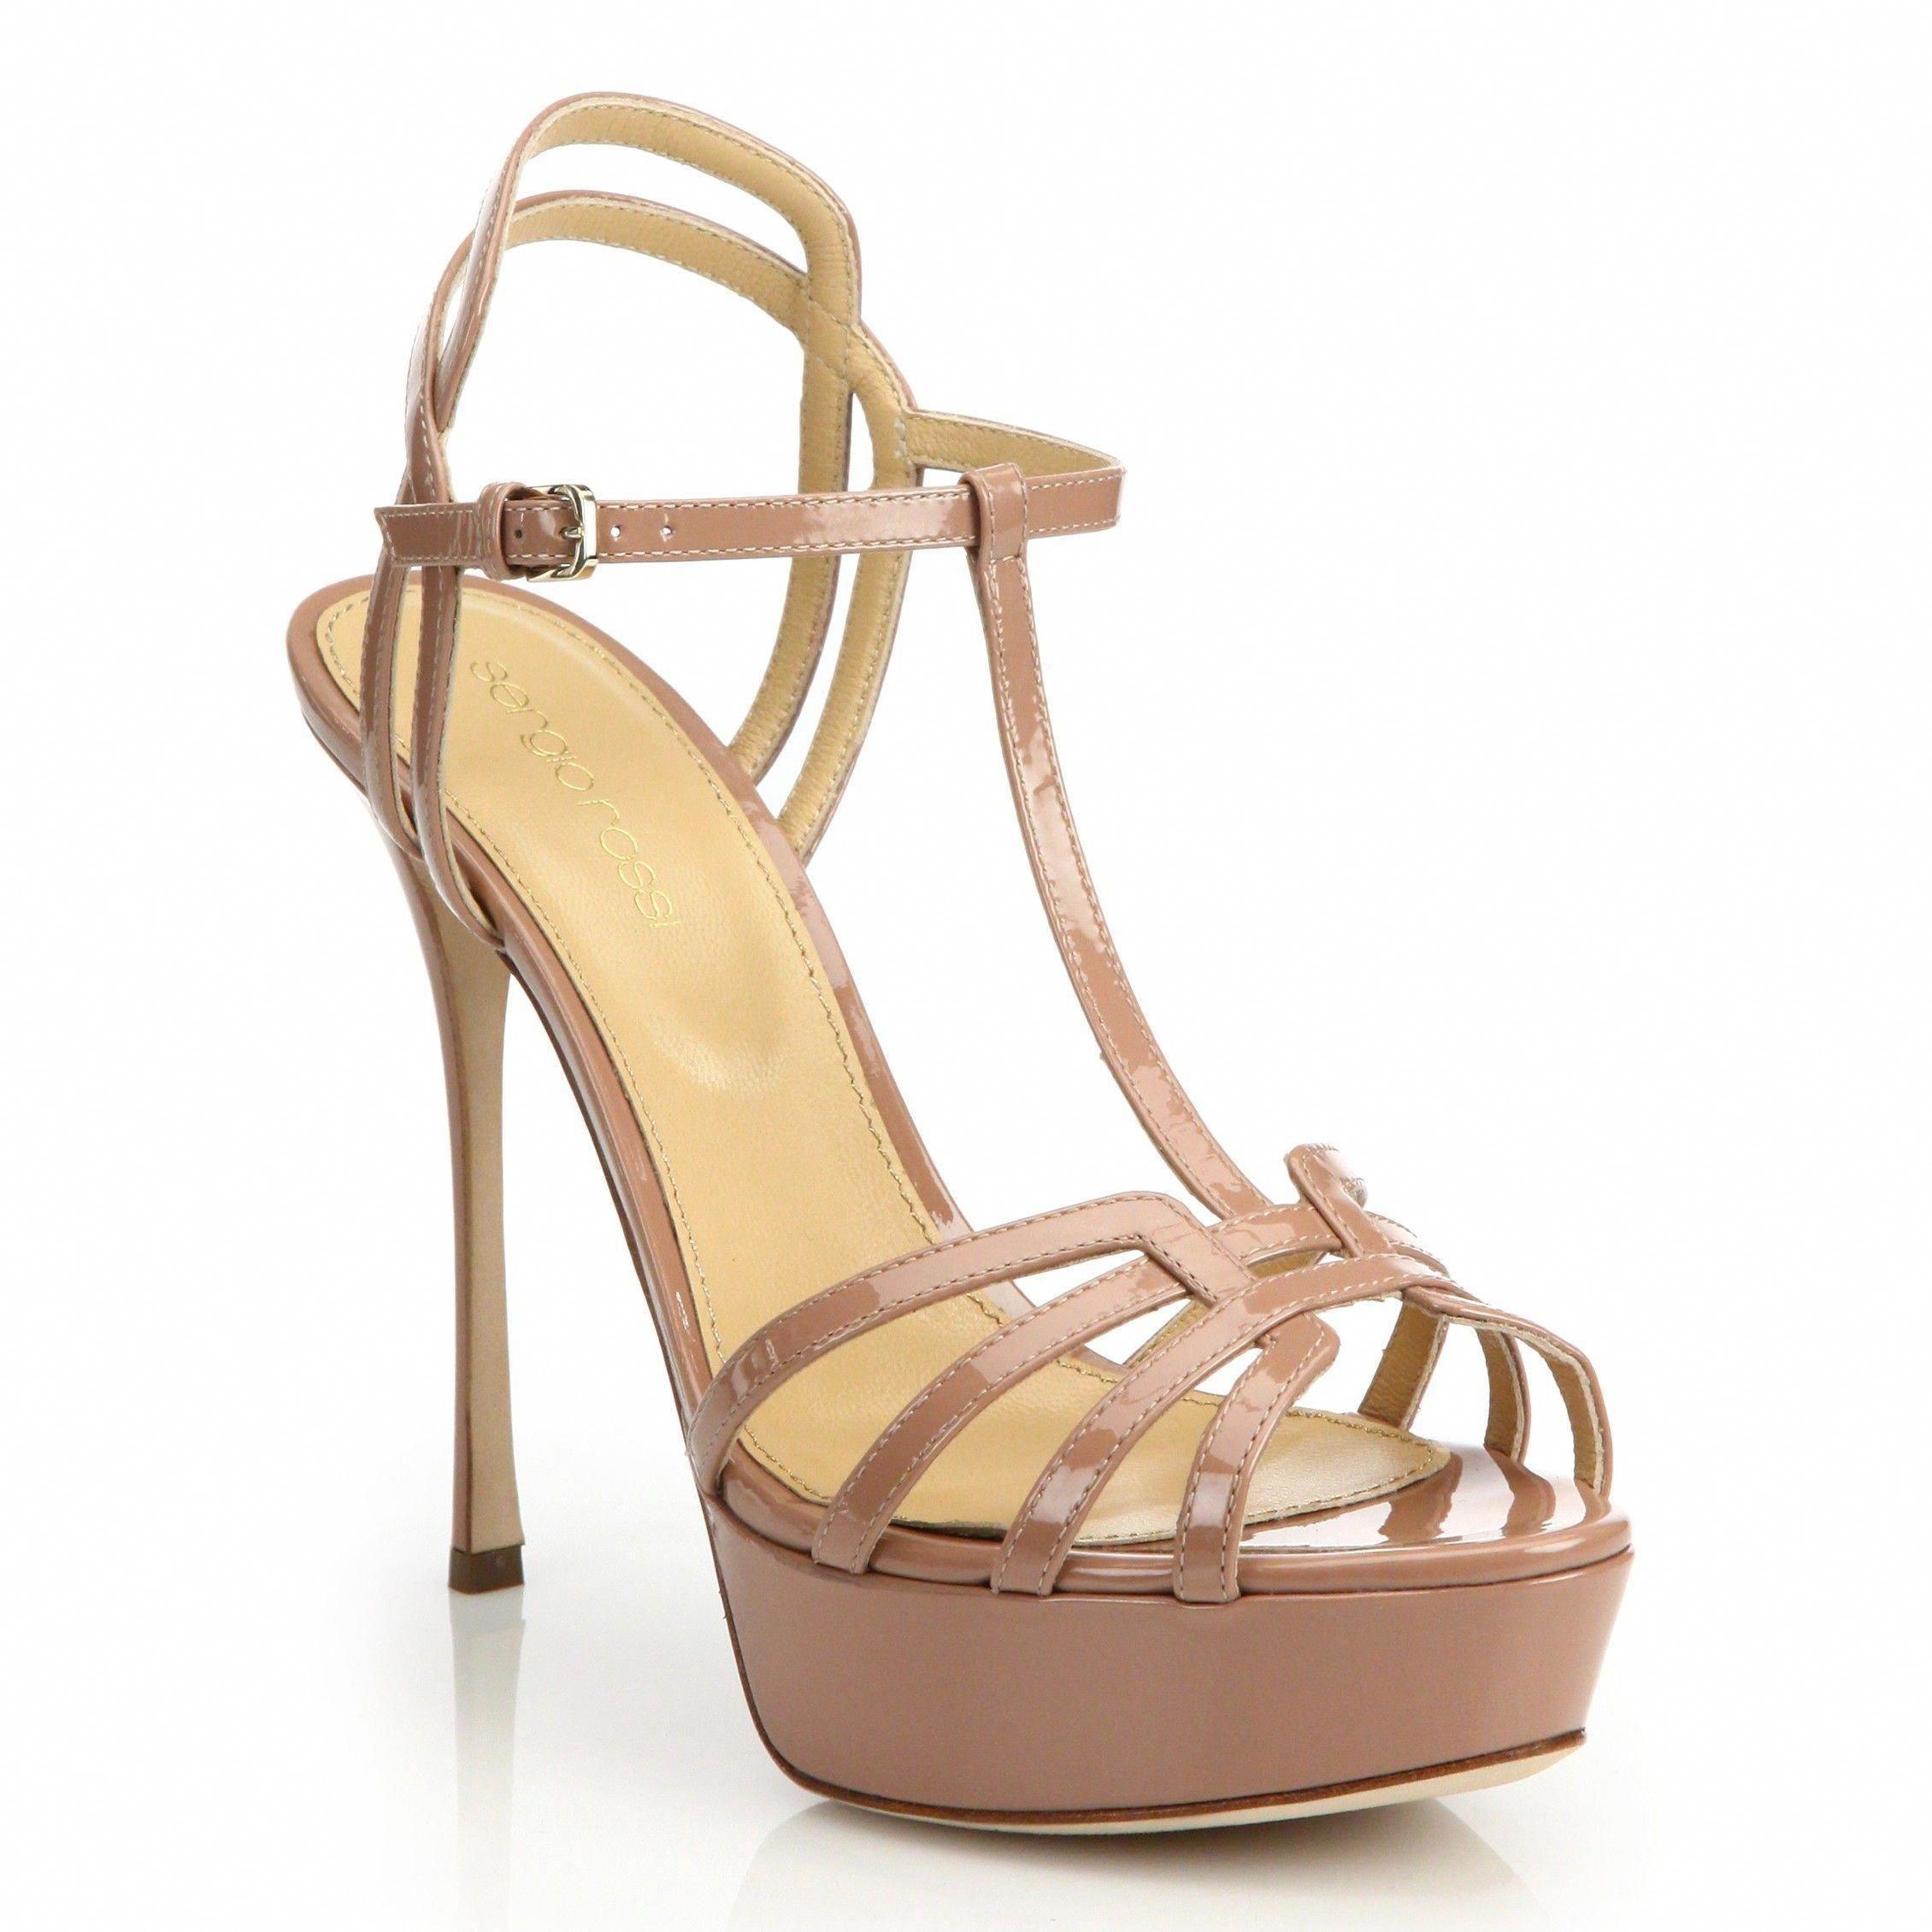 972bce00dd2 SERGIO ROSSI Ines Patent T-Strap Platform Sandals.  sergiorossi  shoes